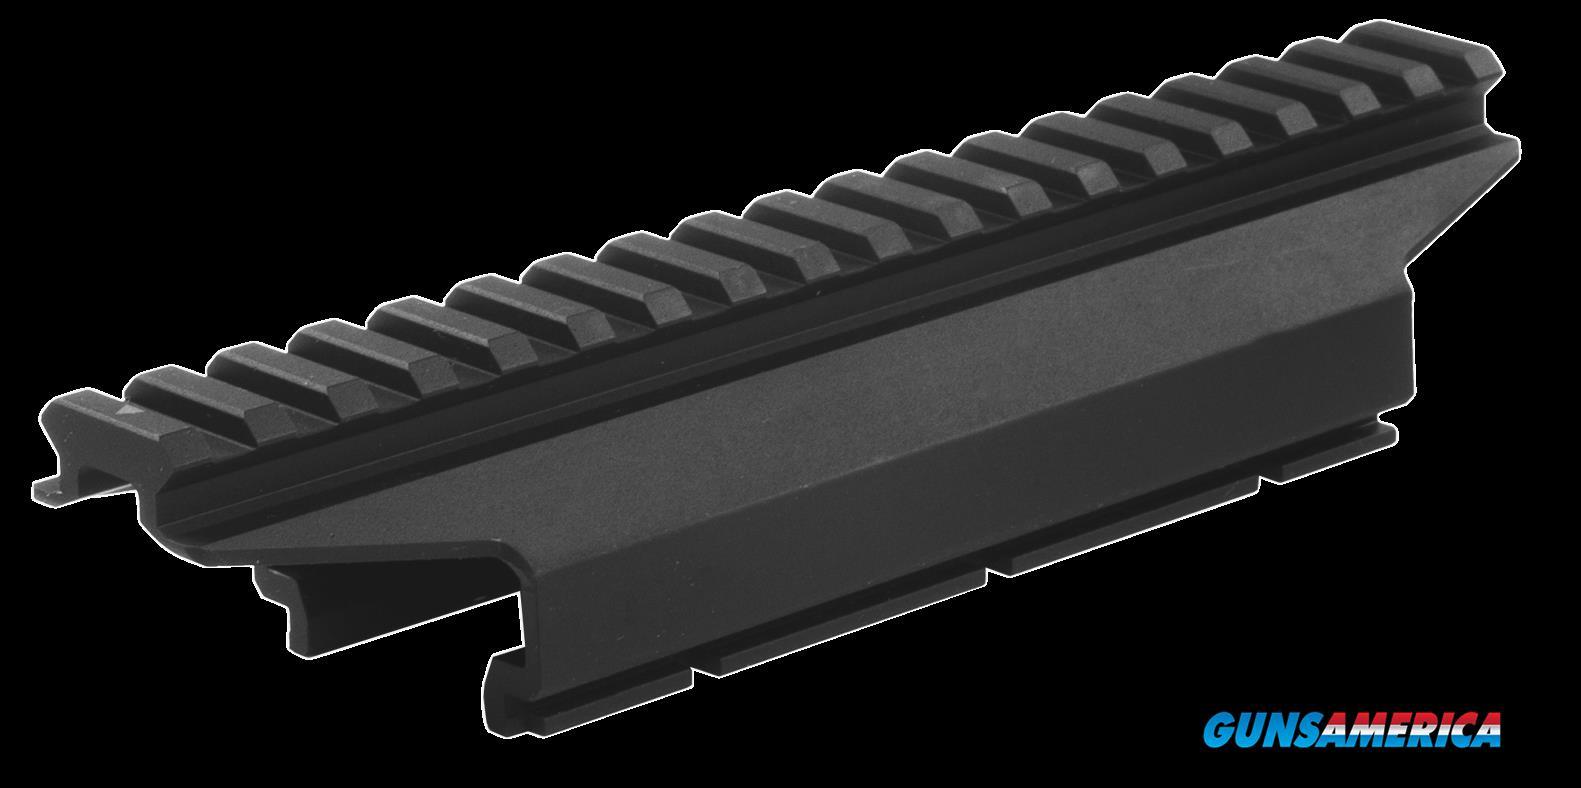 Magpul Industries Corp Pro Nvm, Magpul Mag1001-blk Pro Nvm Night Vision Mount  Guns > Pistols > 1911 Pistol Copies (non-Colt)